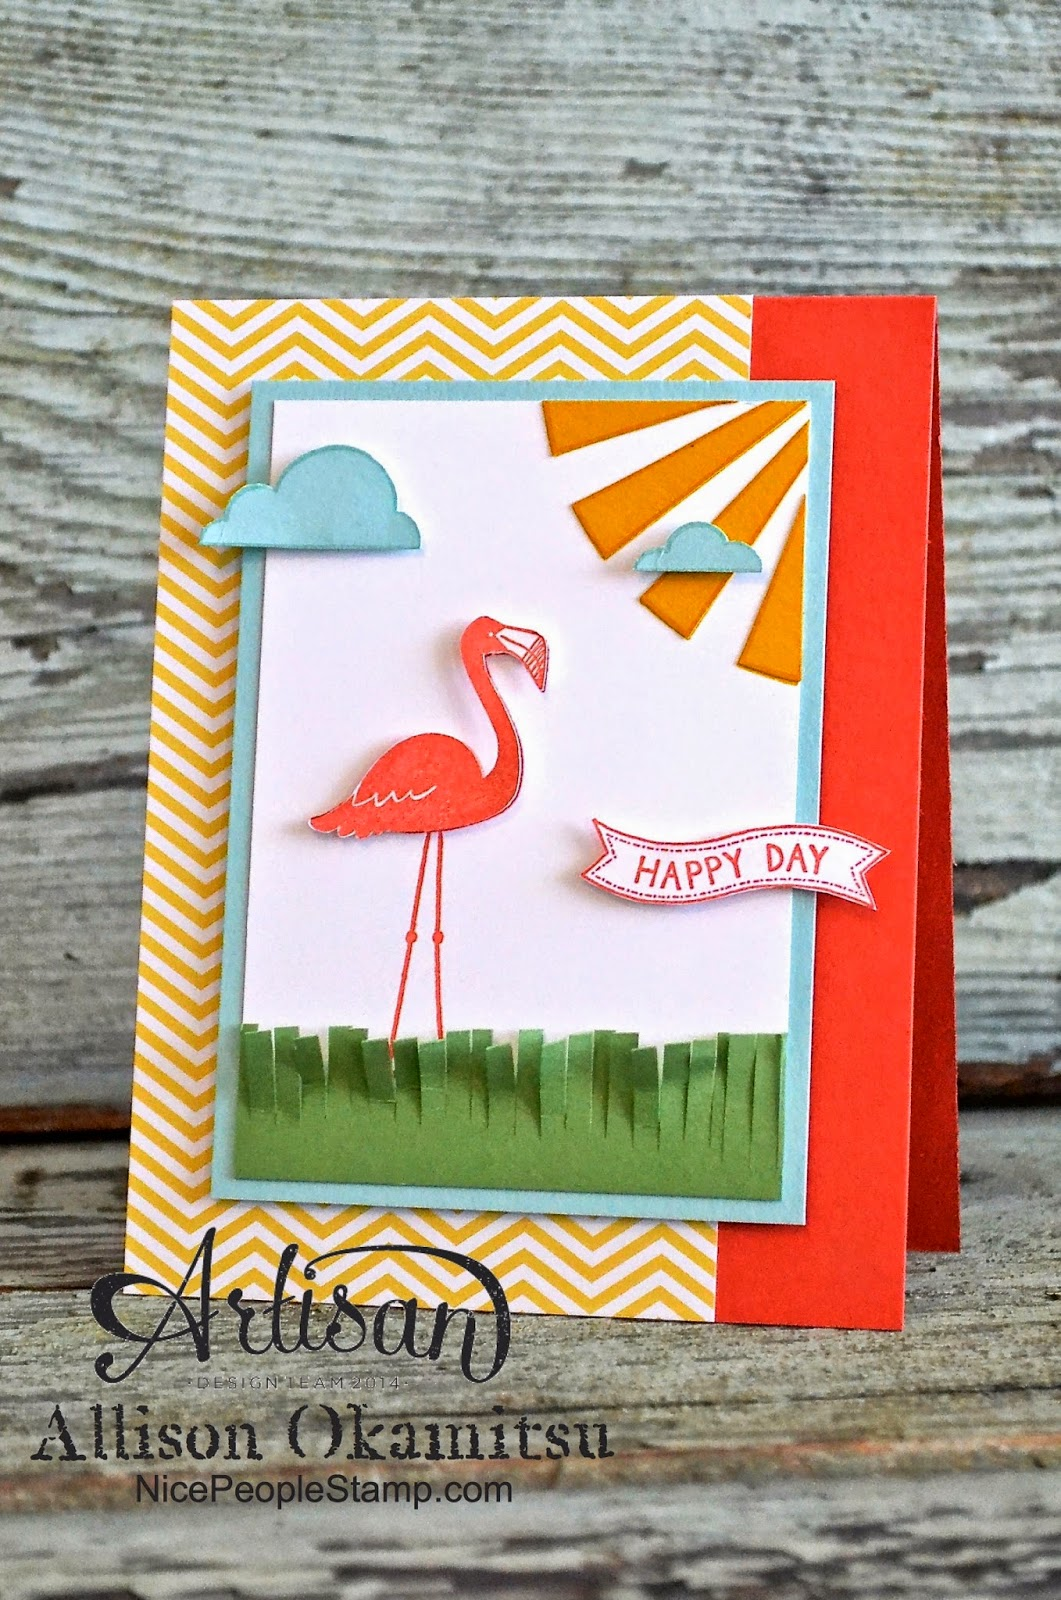 http://nicepeoplestamp.blogspot.com/2015/05/first-tgif-challenge-flamingo-lingo-so.html